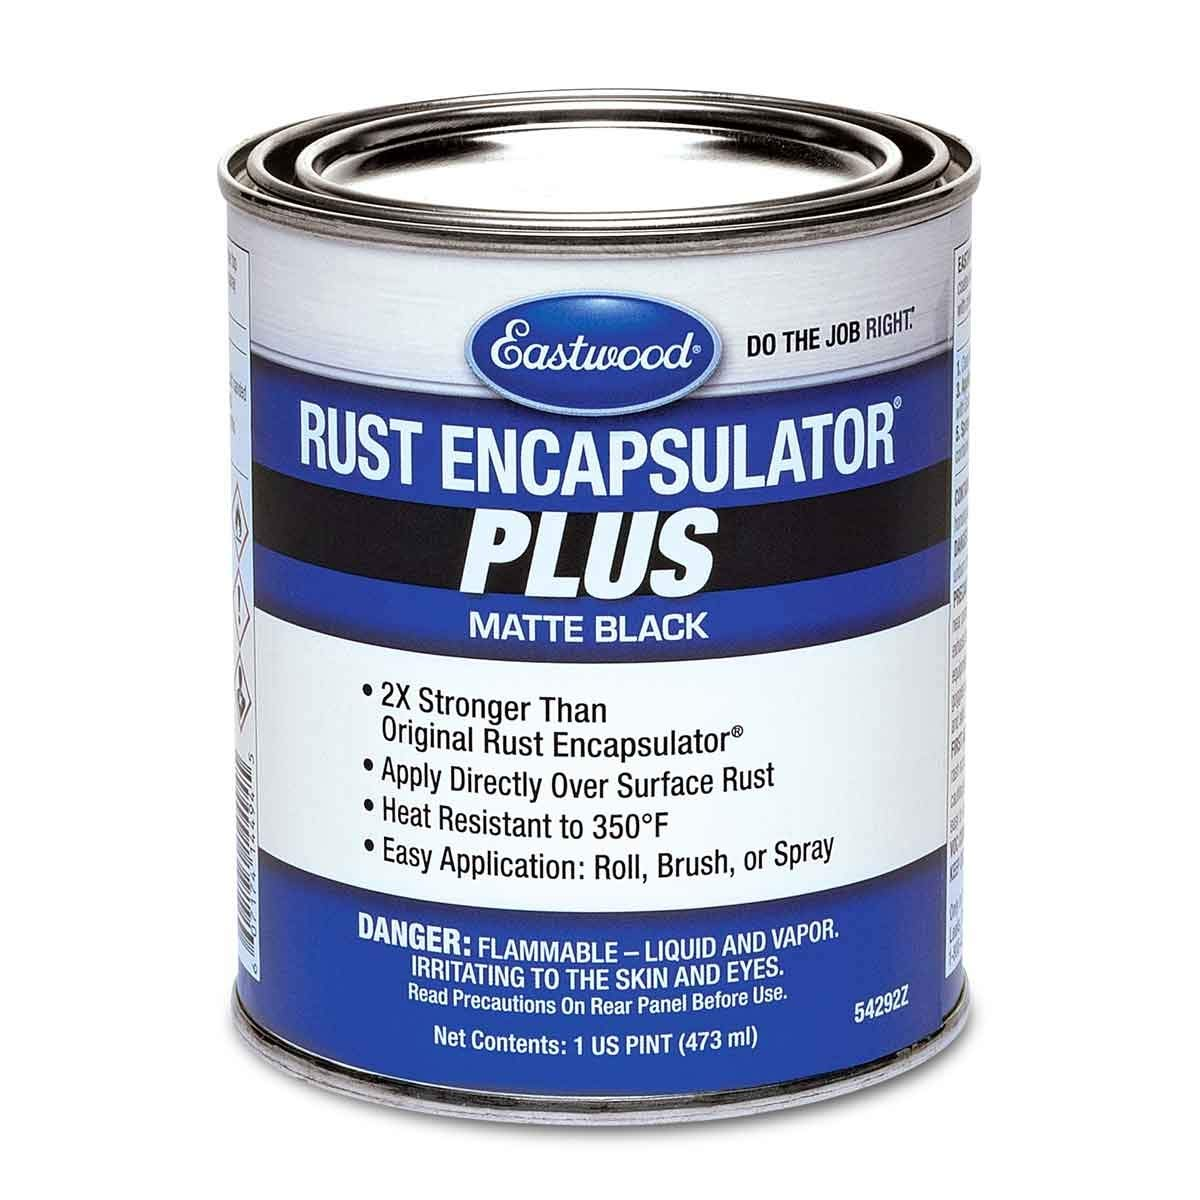 Eastwood Matte Black Rust Encapsulator Plus Pint Long Lasting Durable Finish Heat Resistant